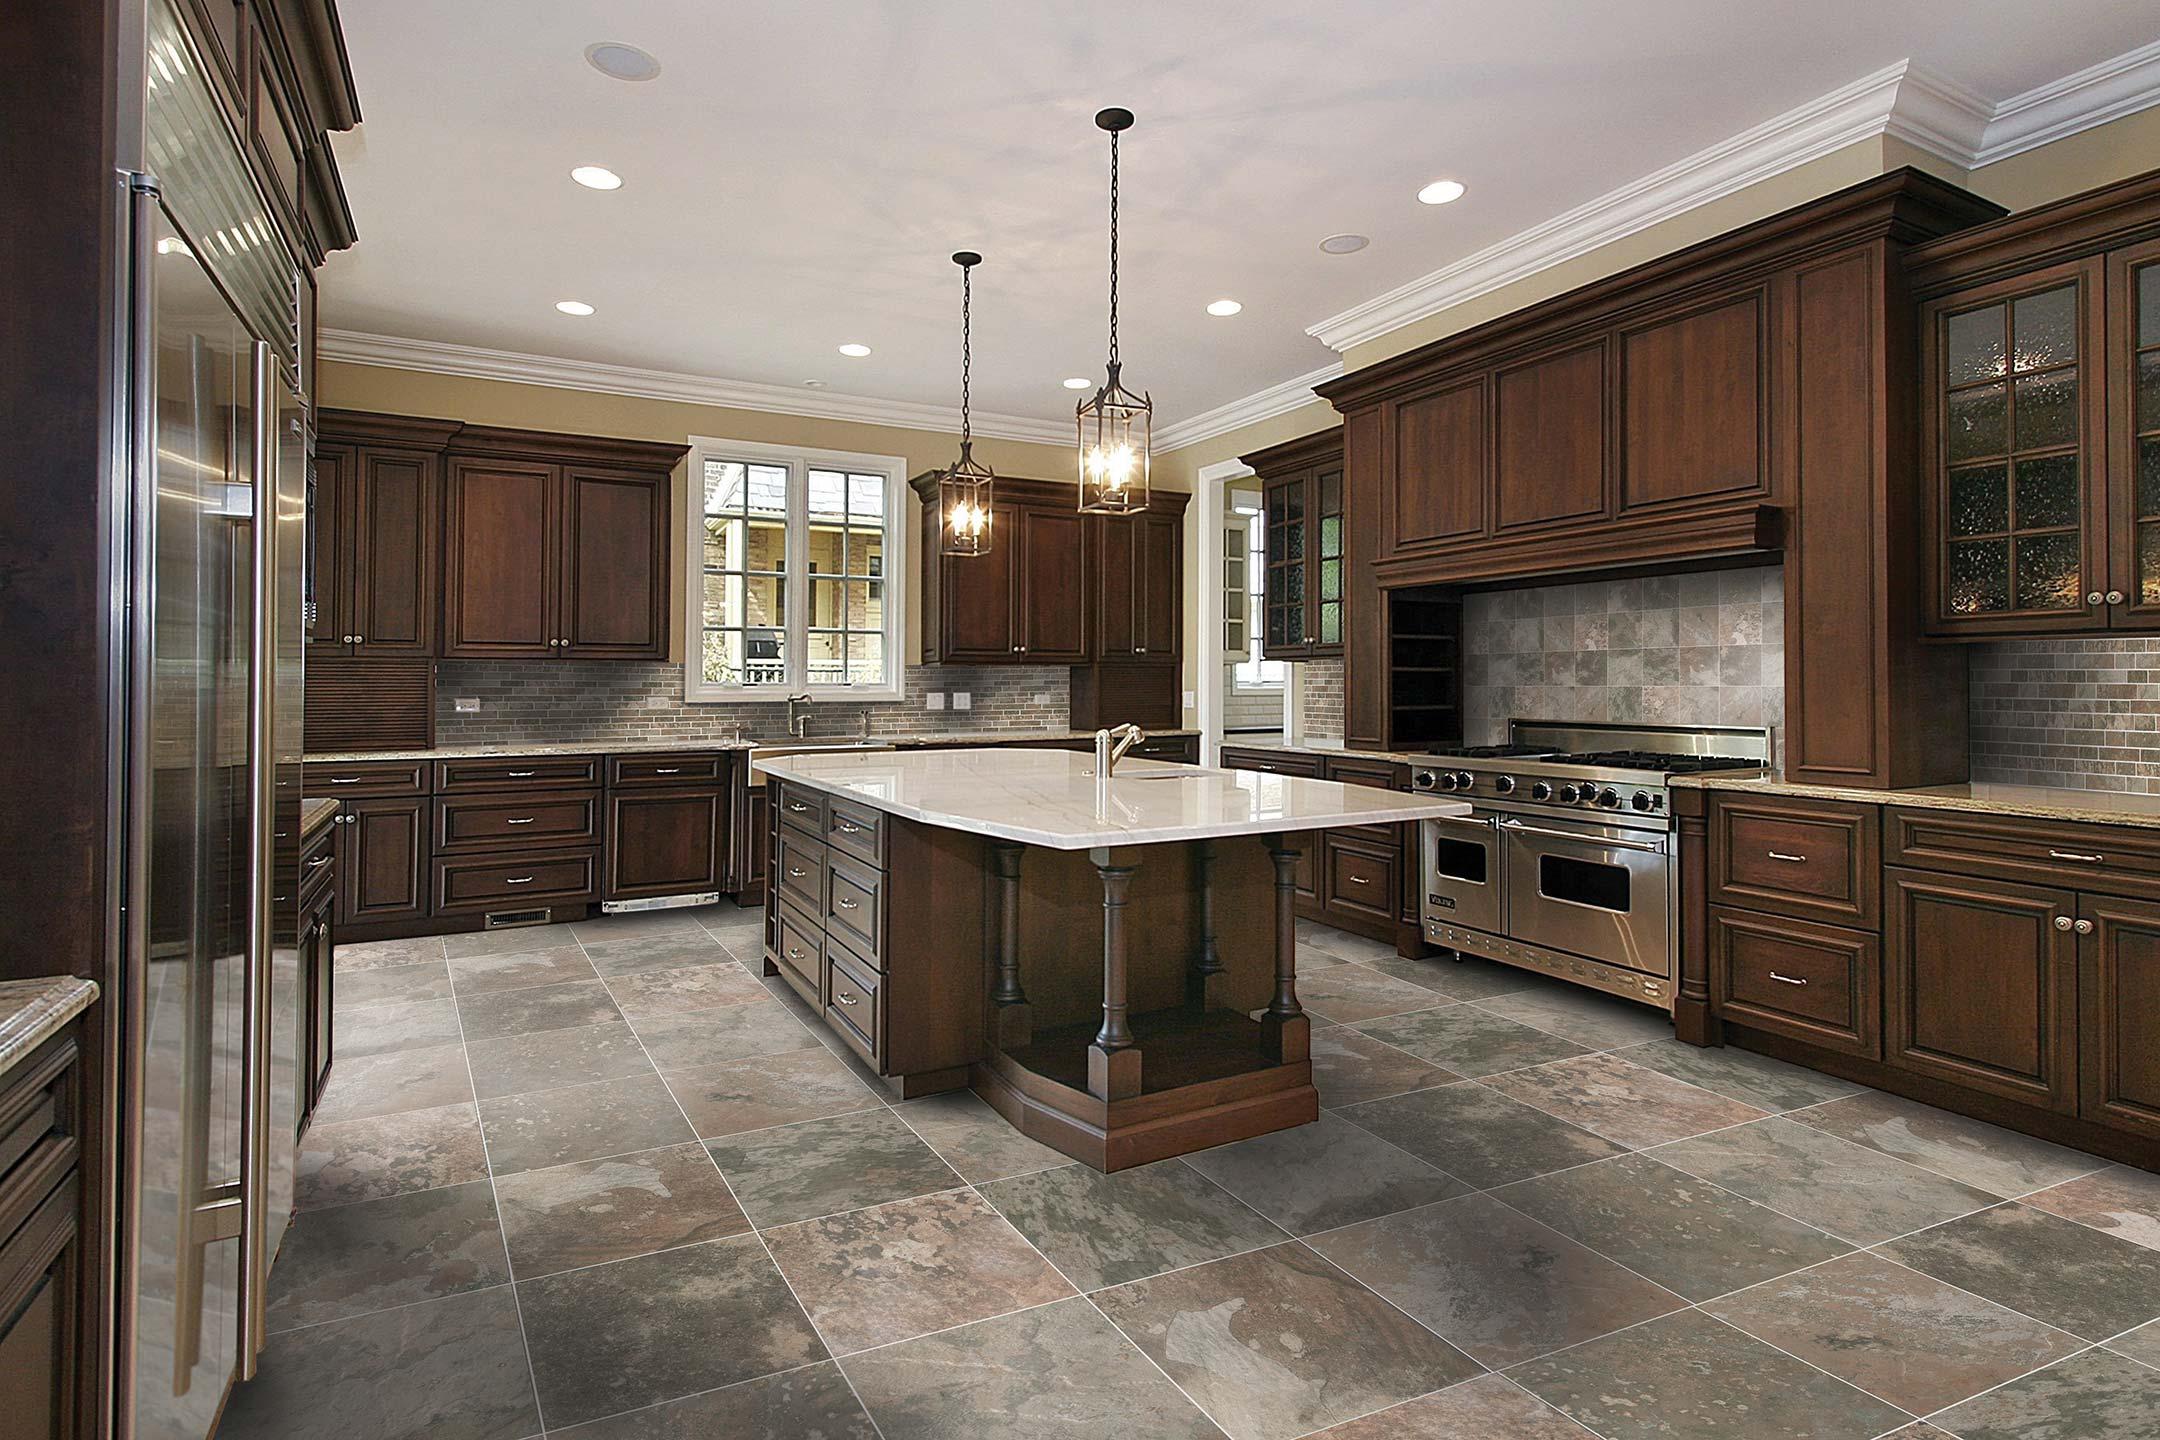 Kitchen Floor Ceramic Tiles Florim Usa Afrika Nairobi 18x18 Sq Ft 361 Hassle Free Flooring